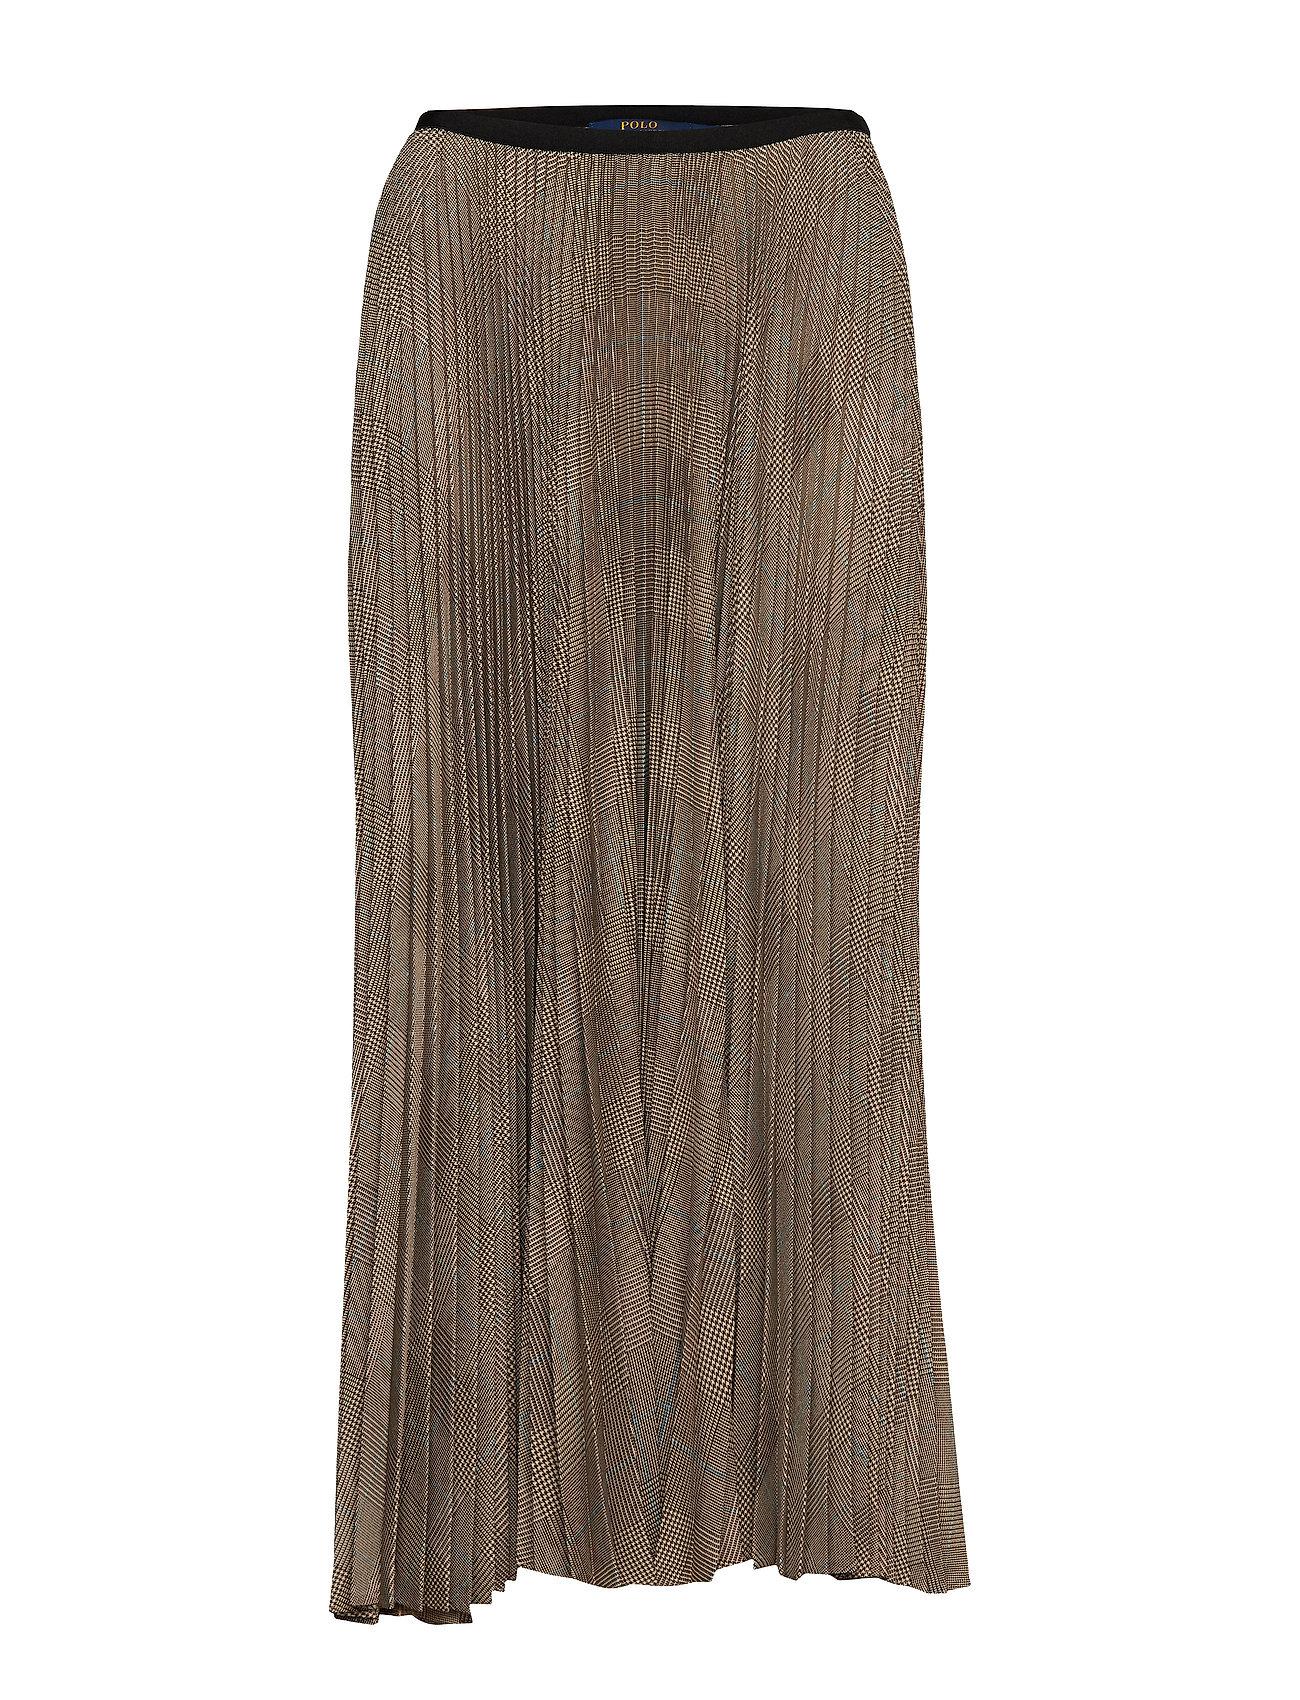 Polo Ralph Lauren Plaid Pleated Midi Skirt - SMALL GLEN PLAID